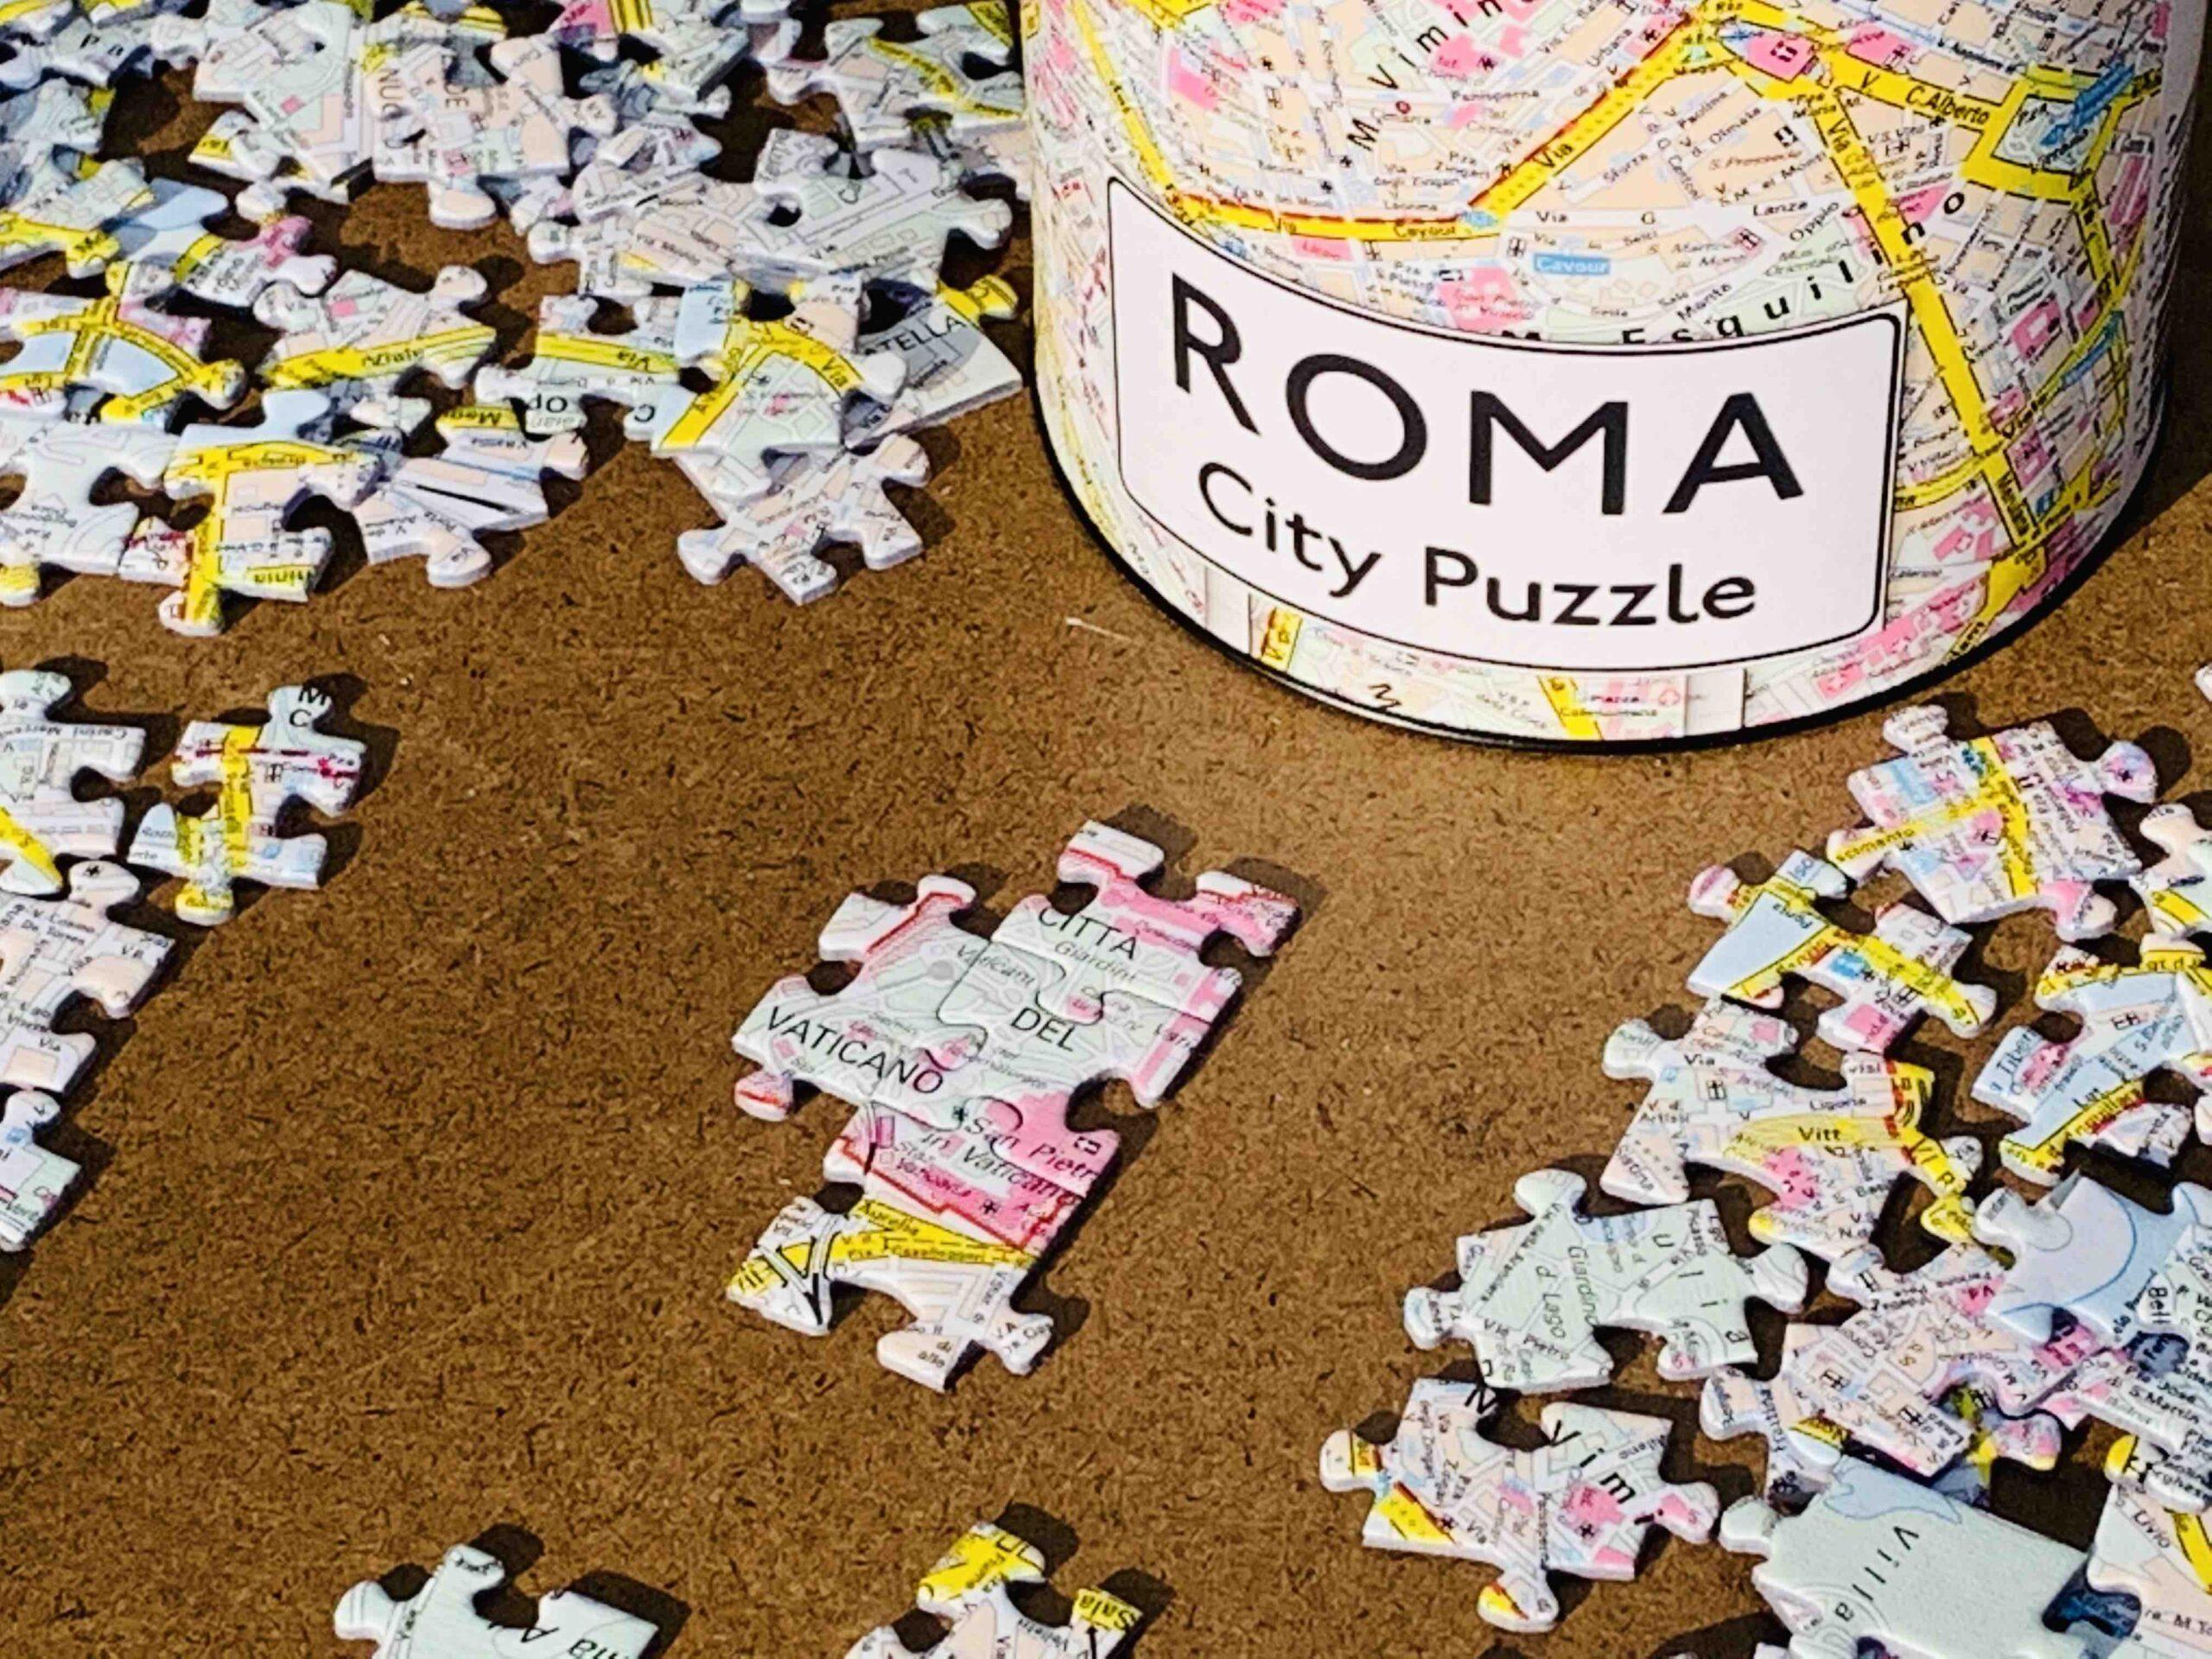 Roma City Puzzle